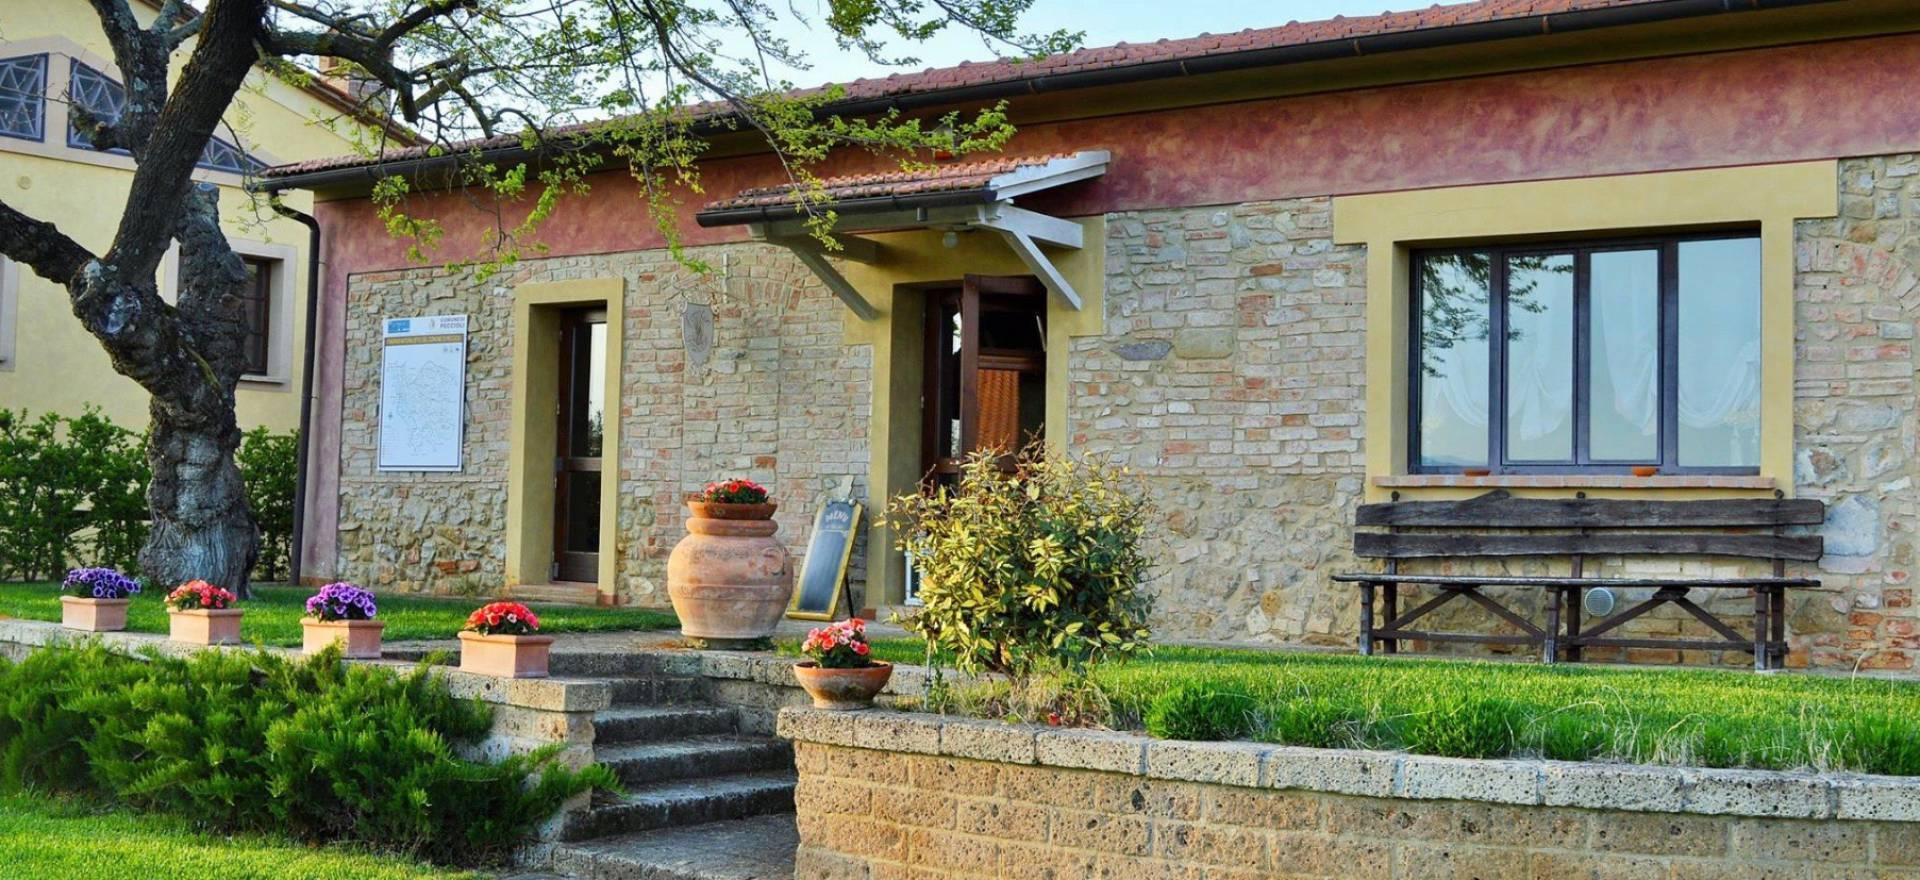 Agriturismo Toscana Agriturismo in zona tranquilla, Toscana, tra vigneti